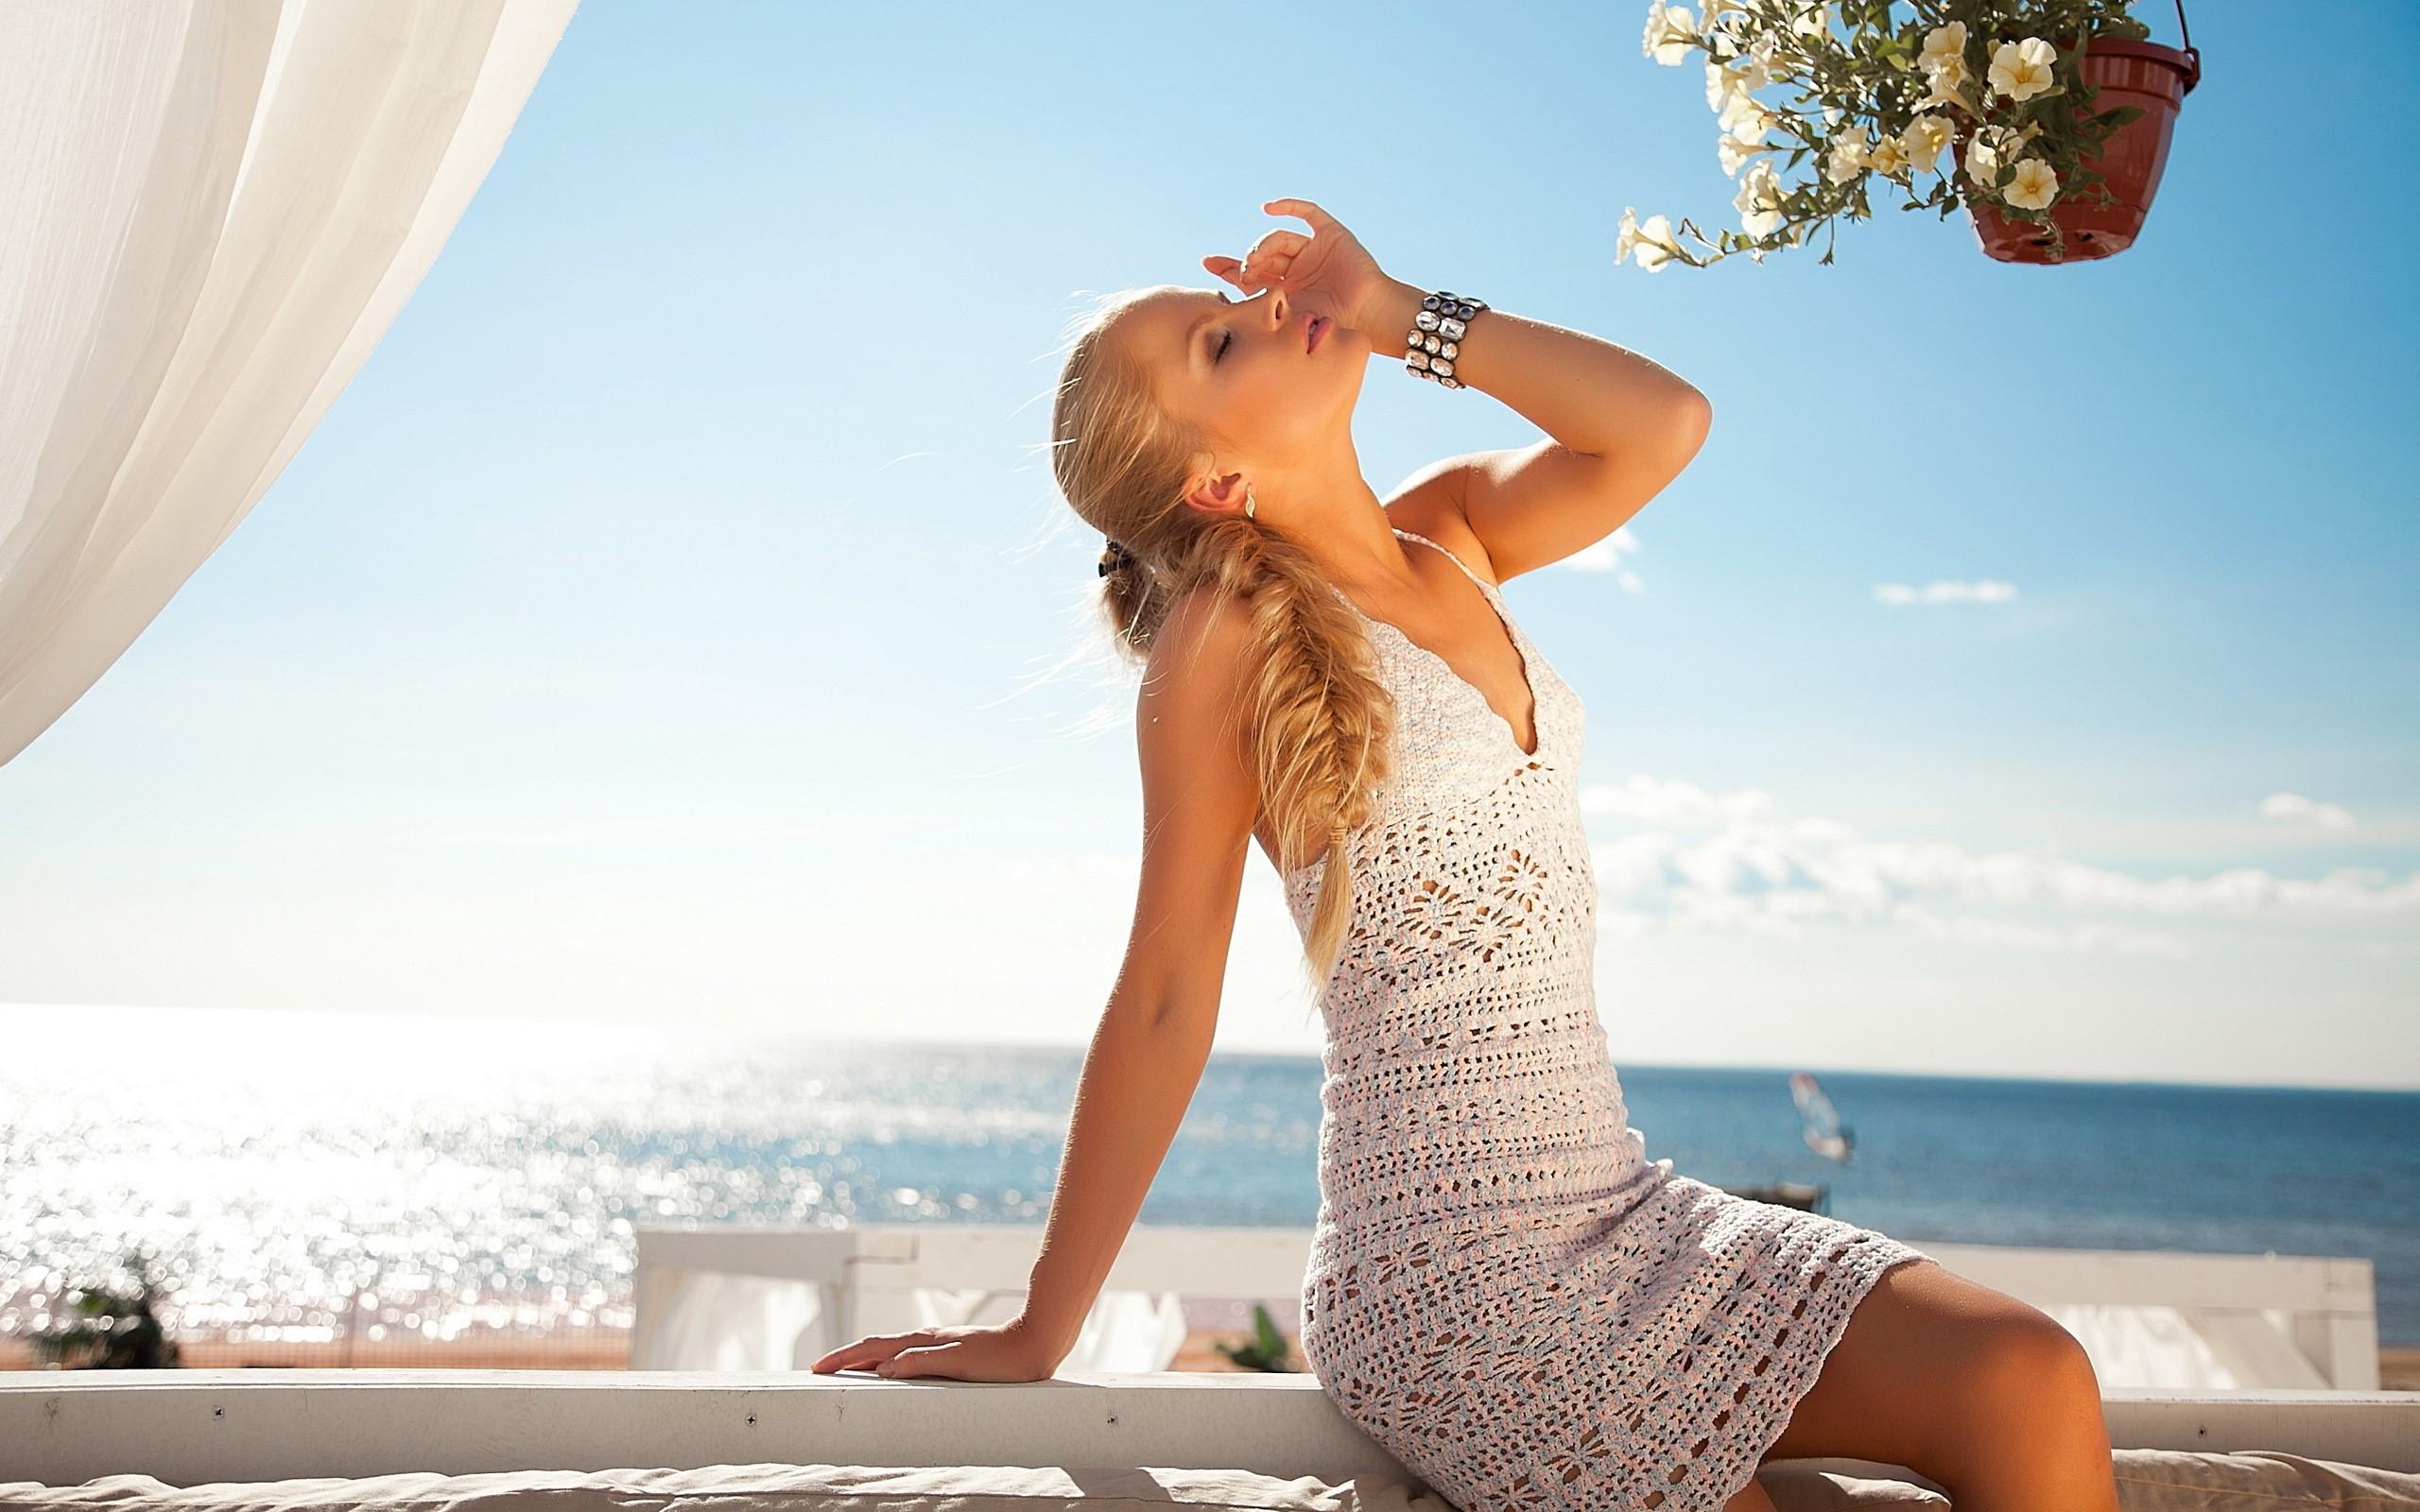 Фото девушек на фоне океана, Фото: Девушка на фоне океана 7 фотография